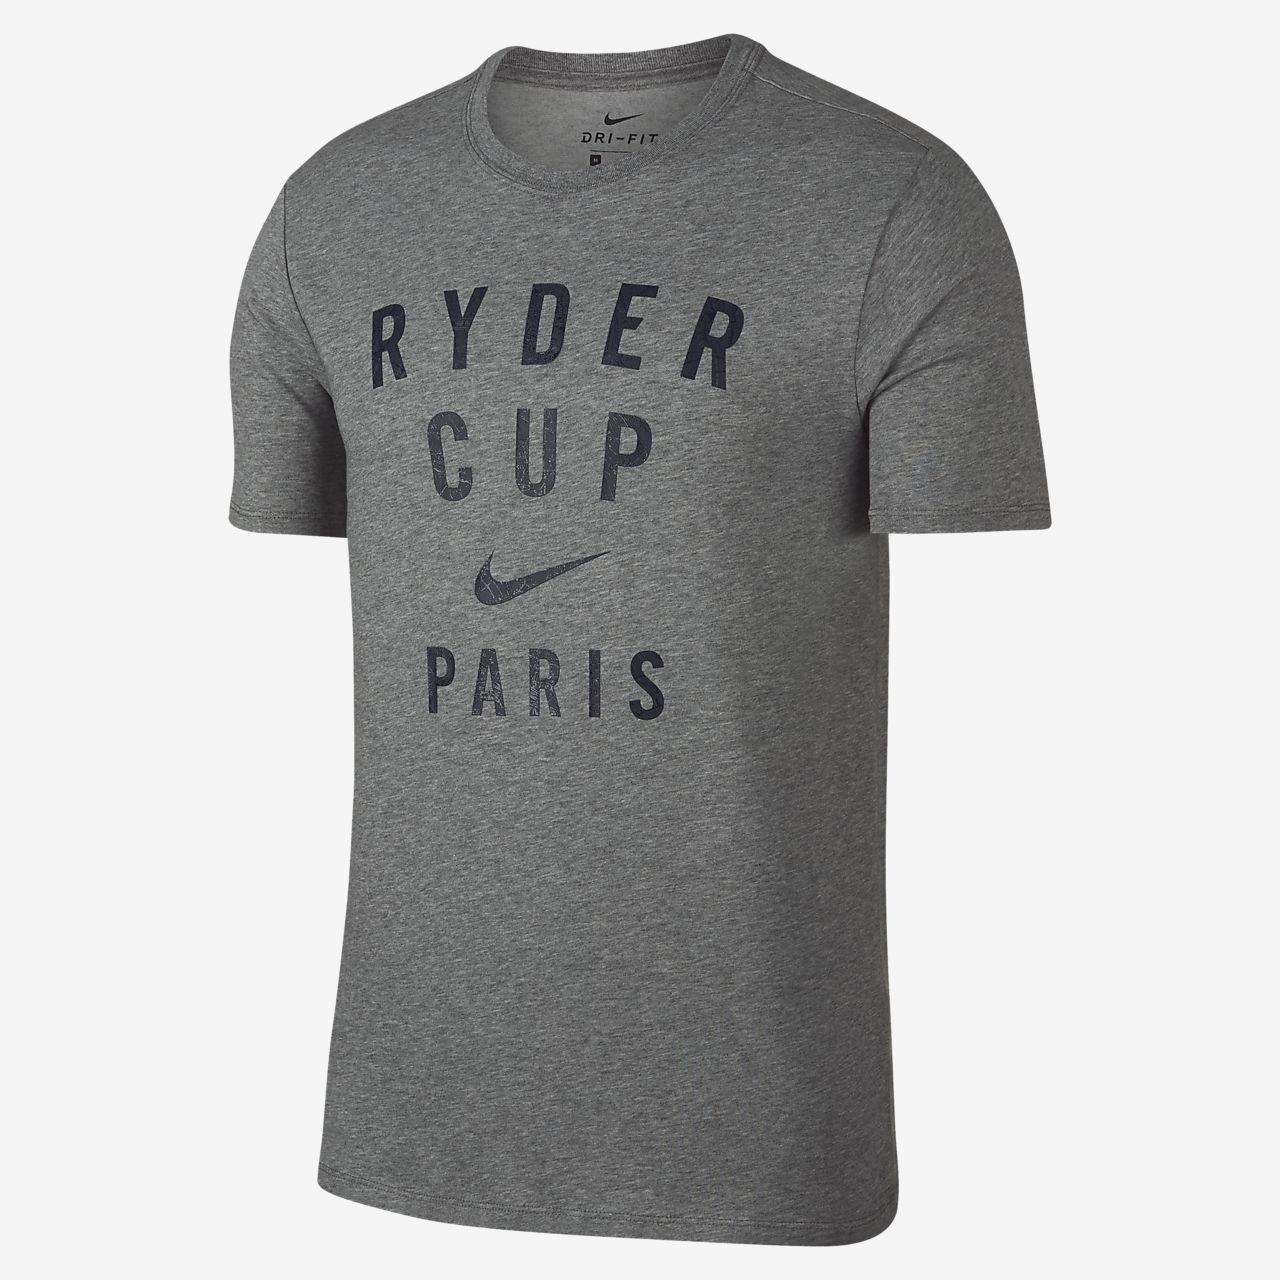 T-shirt da golf con grafica Nike Dri-FIT Ryder Cup